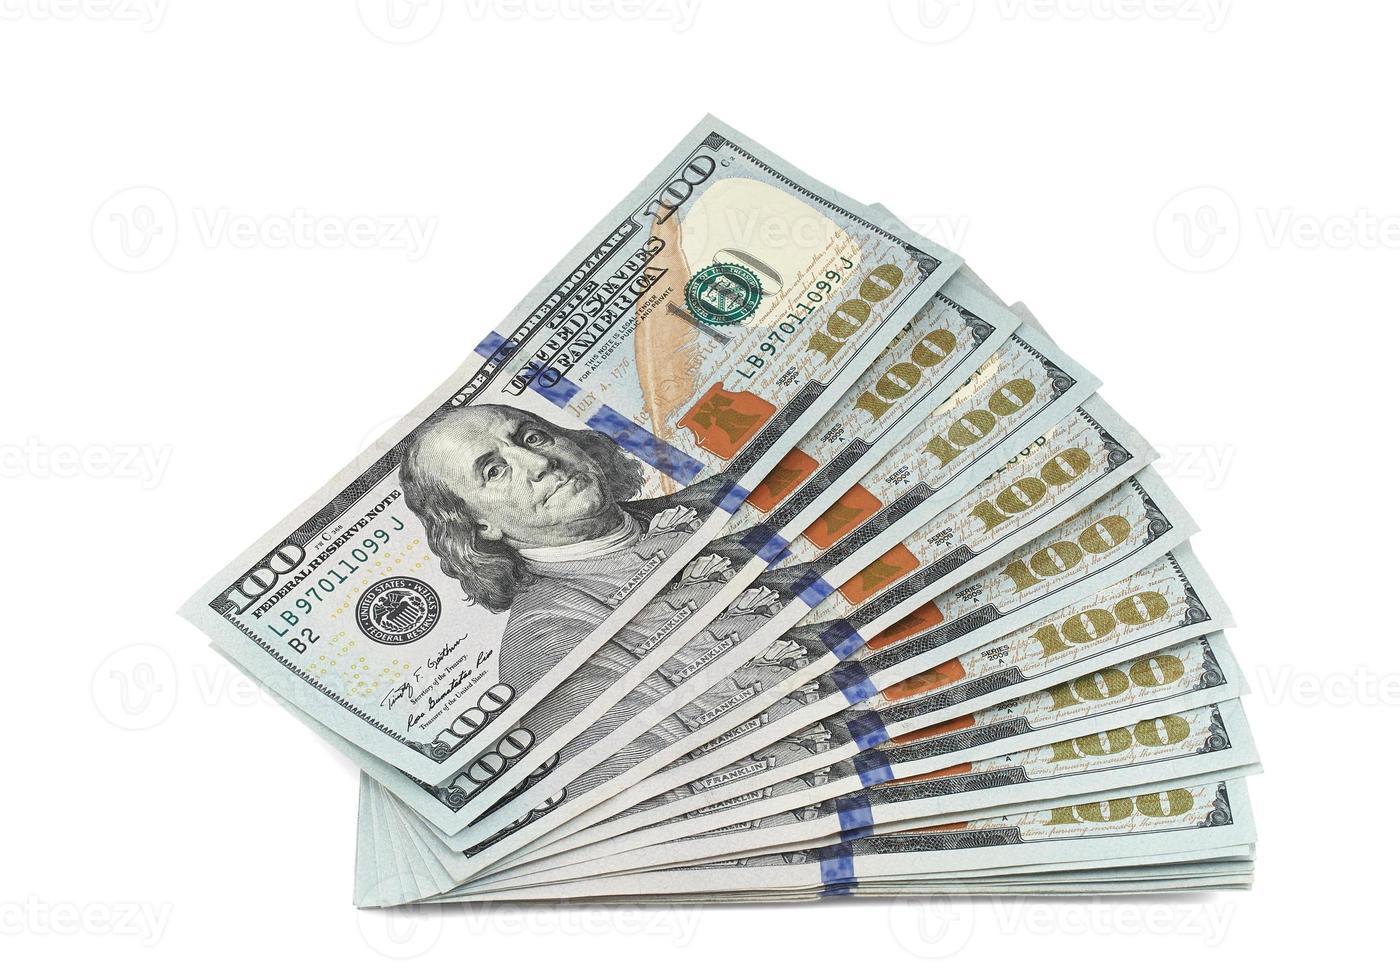 stapel nieuwe 100 dollarbiljetten foto